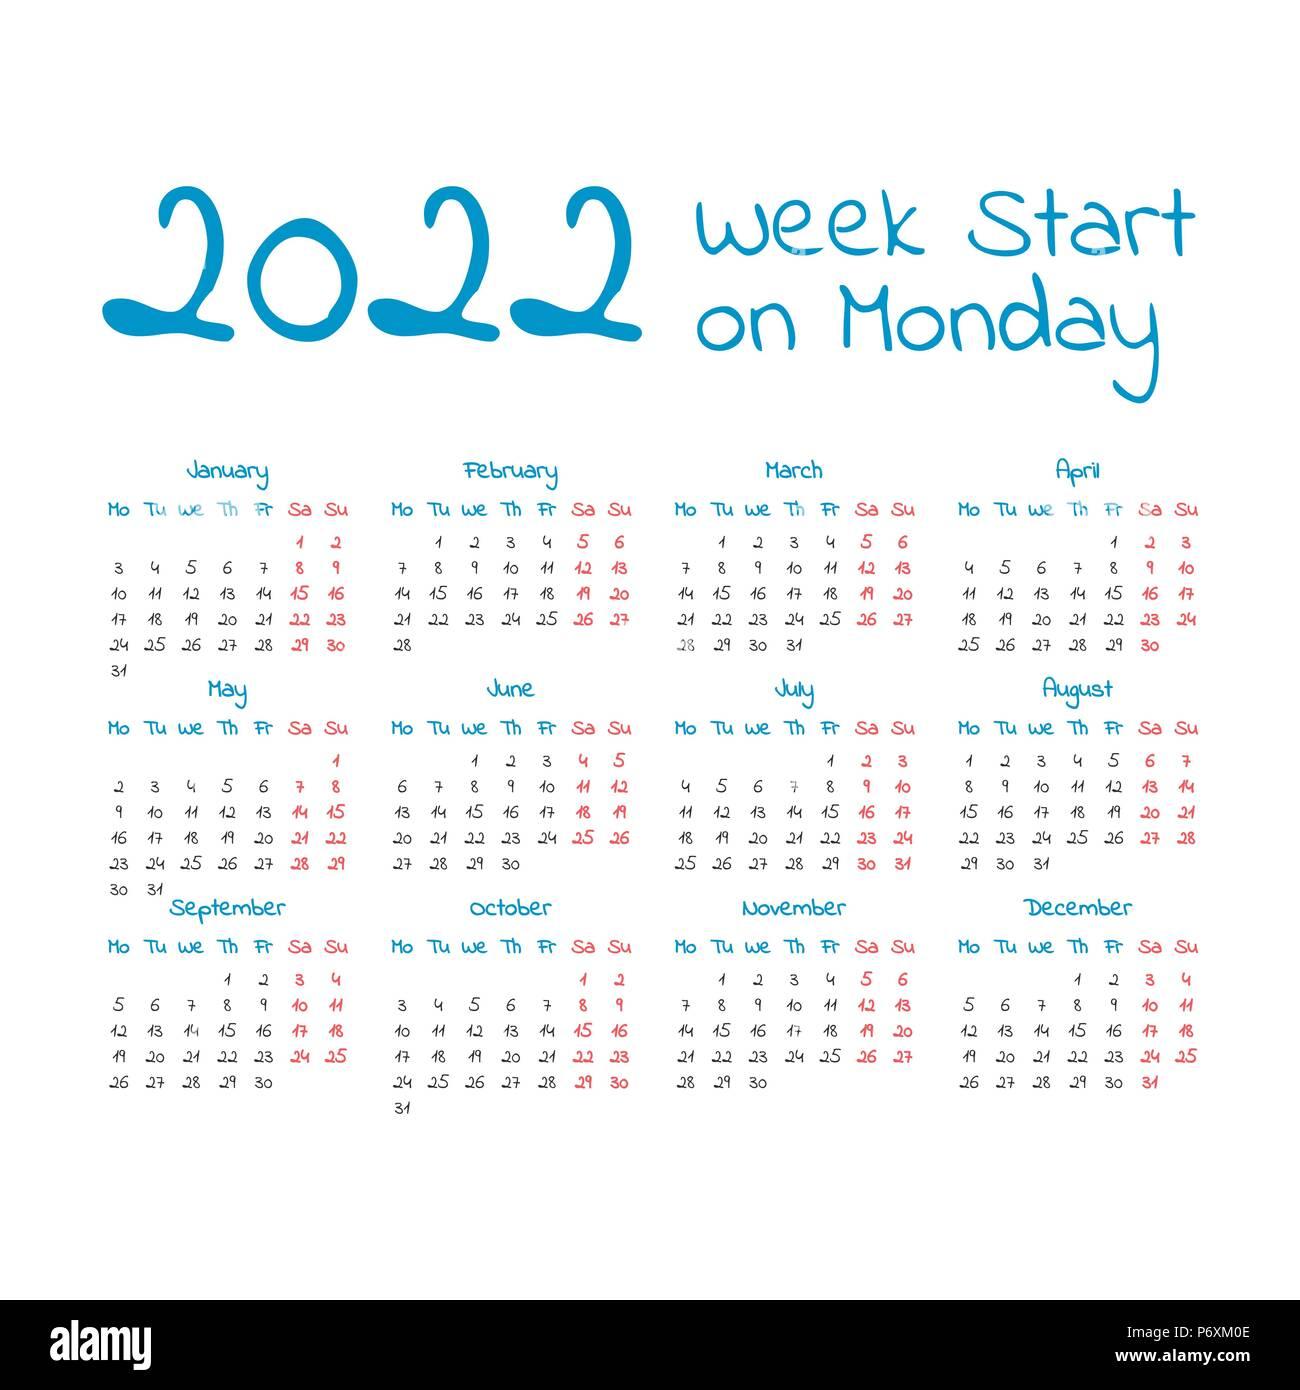 Work Week Calendar 2022.Simple 2022 Year Calendar Week Starts On Monday Stock Vector Image Art Alamy